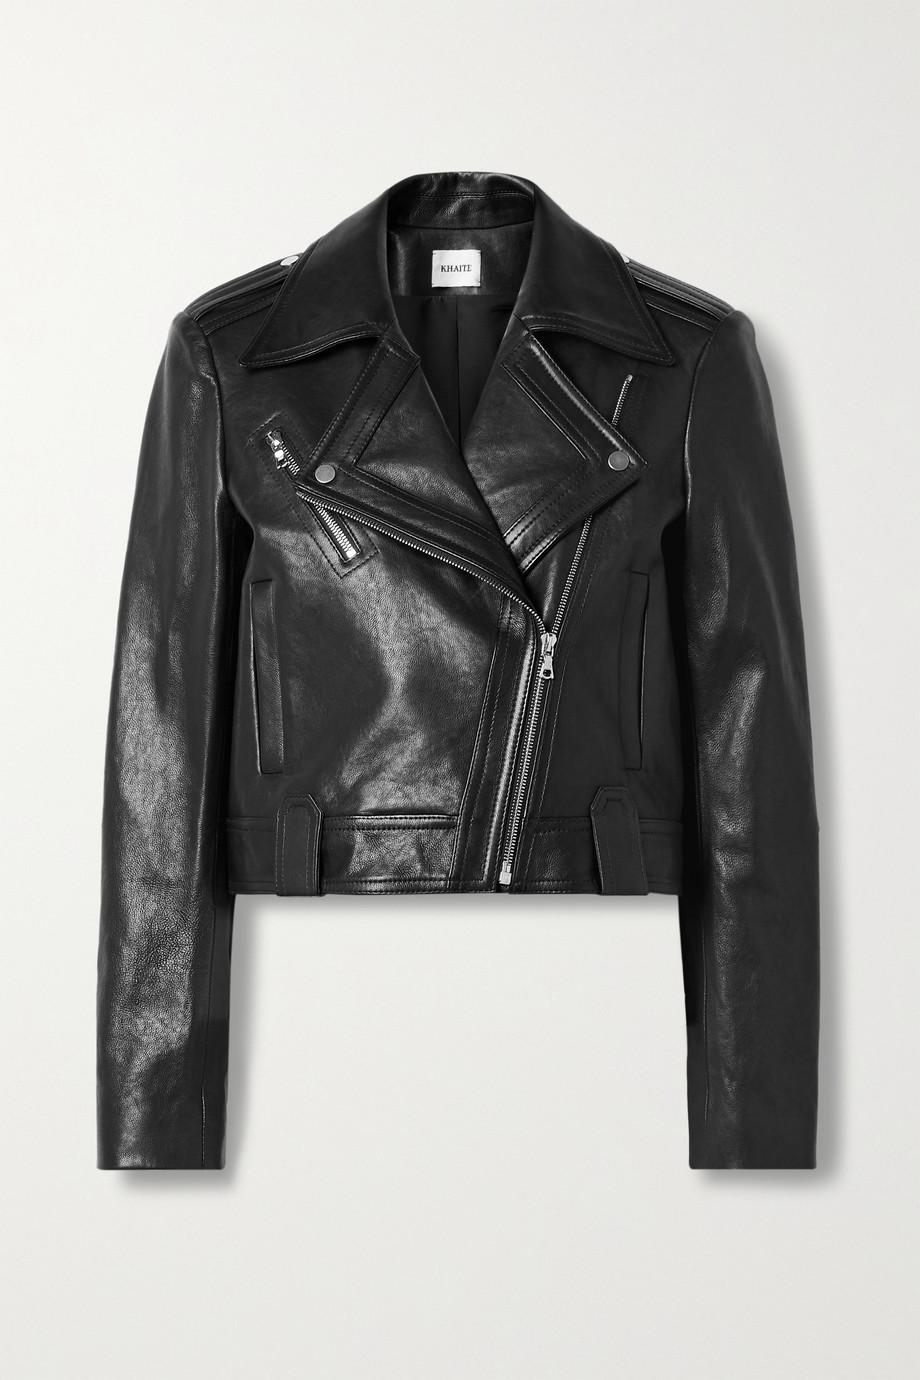 Khaite Antonia leather biker jacket